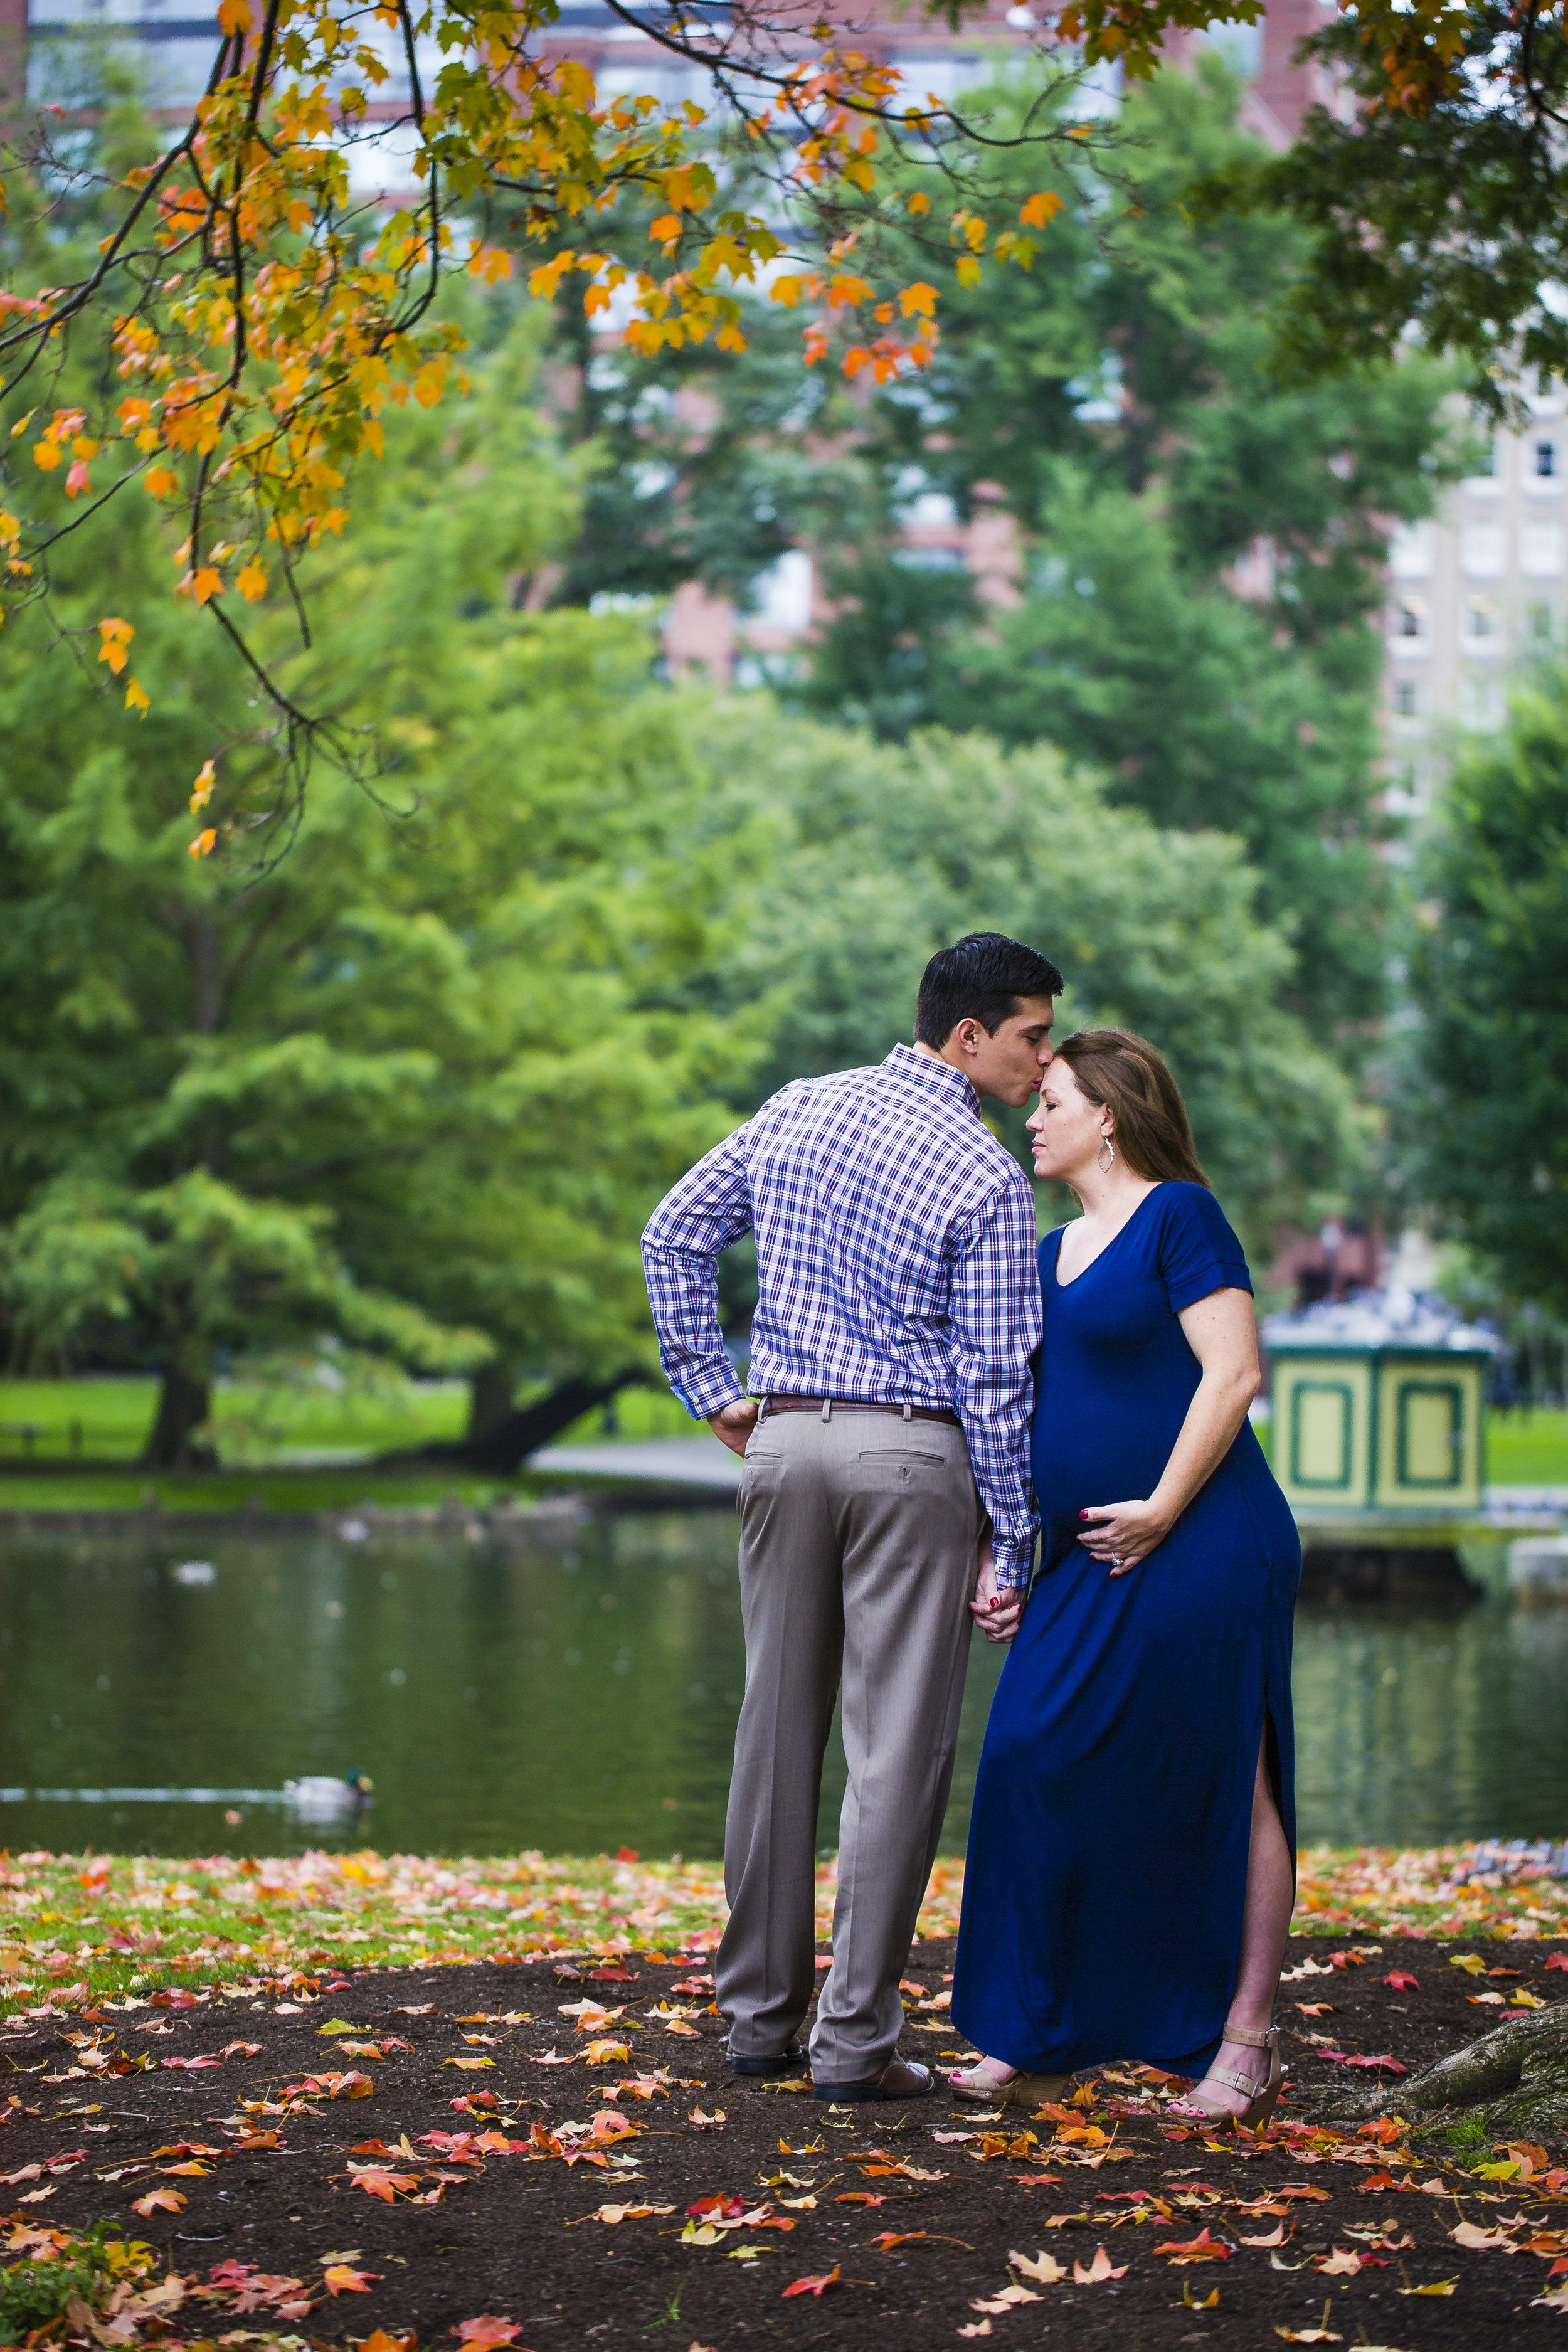 8C2A6332 Giovanni The Photographer Best Boston Maternity New Born Photography Public Garden - Common.jpg